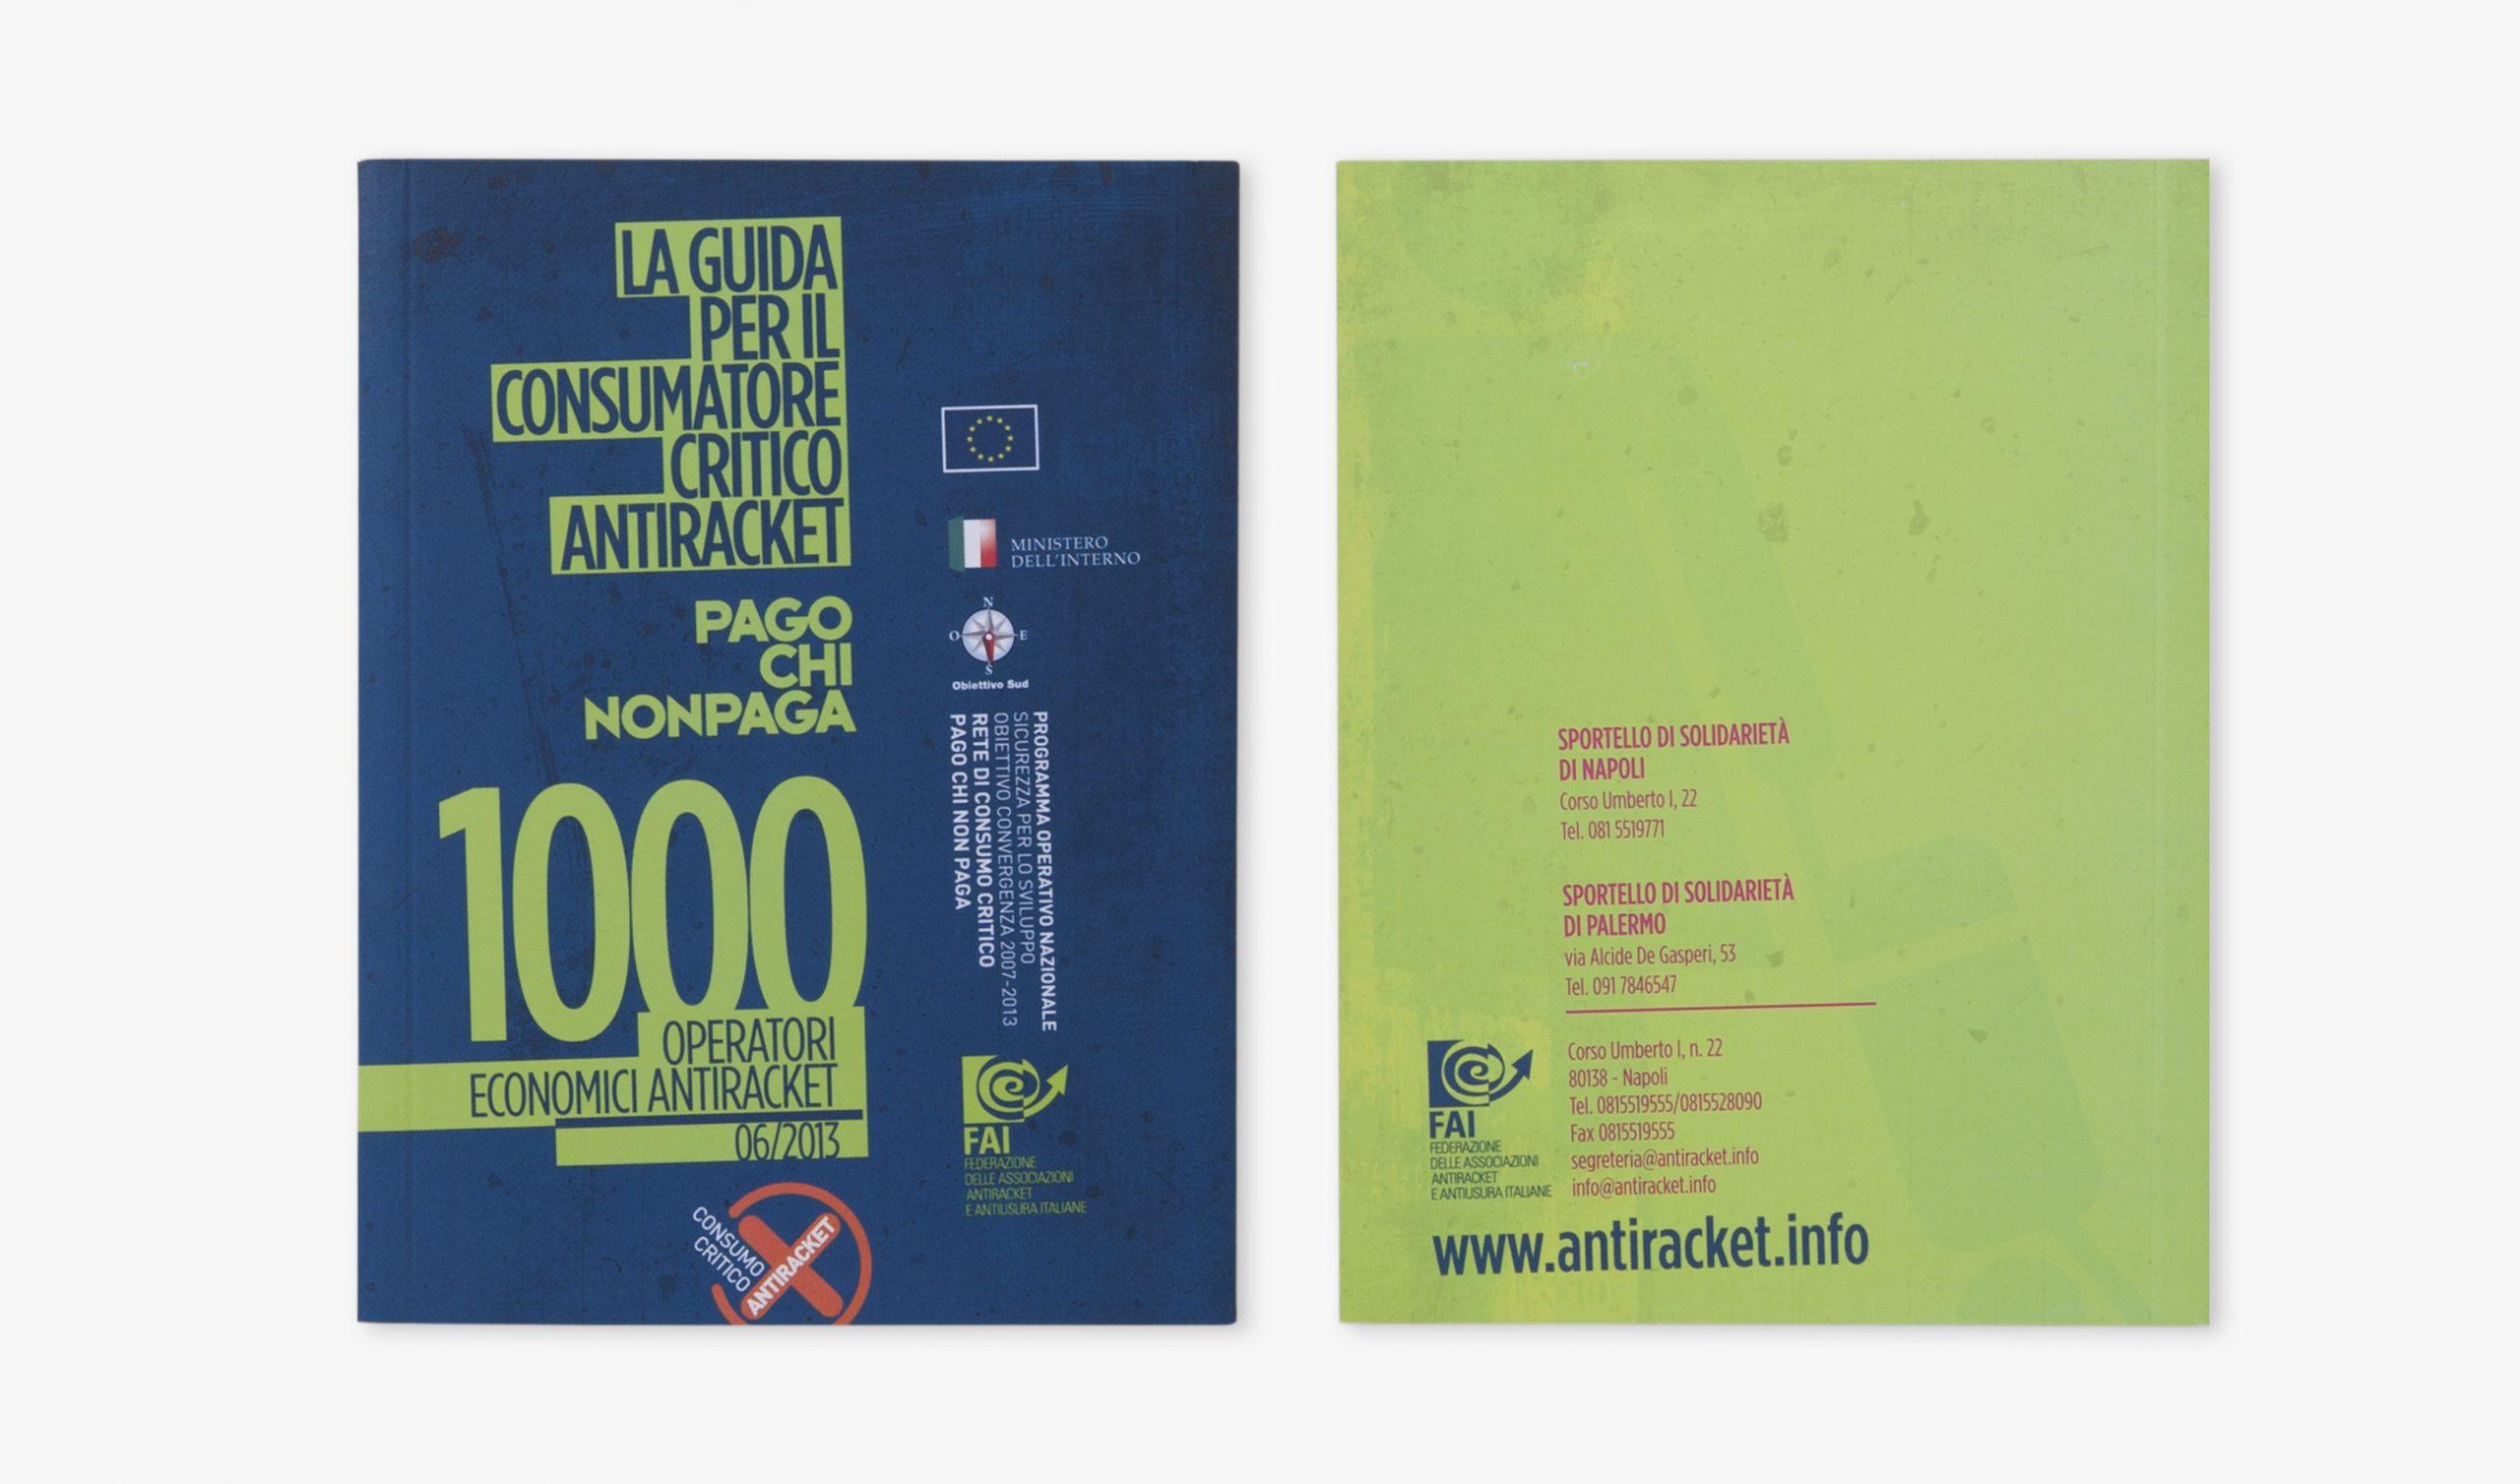 Guida Consumo Critico Antiracket FAI